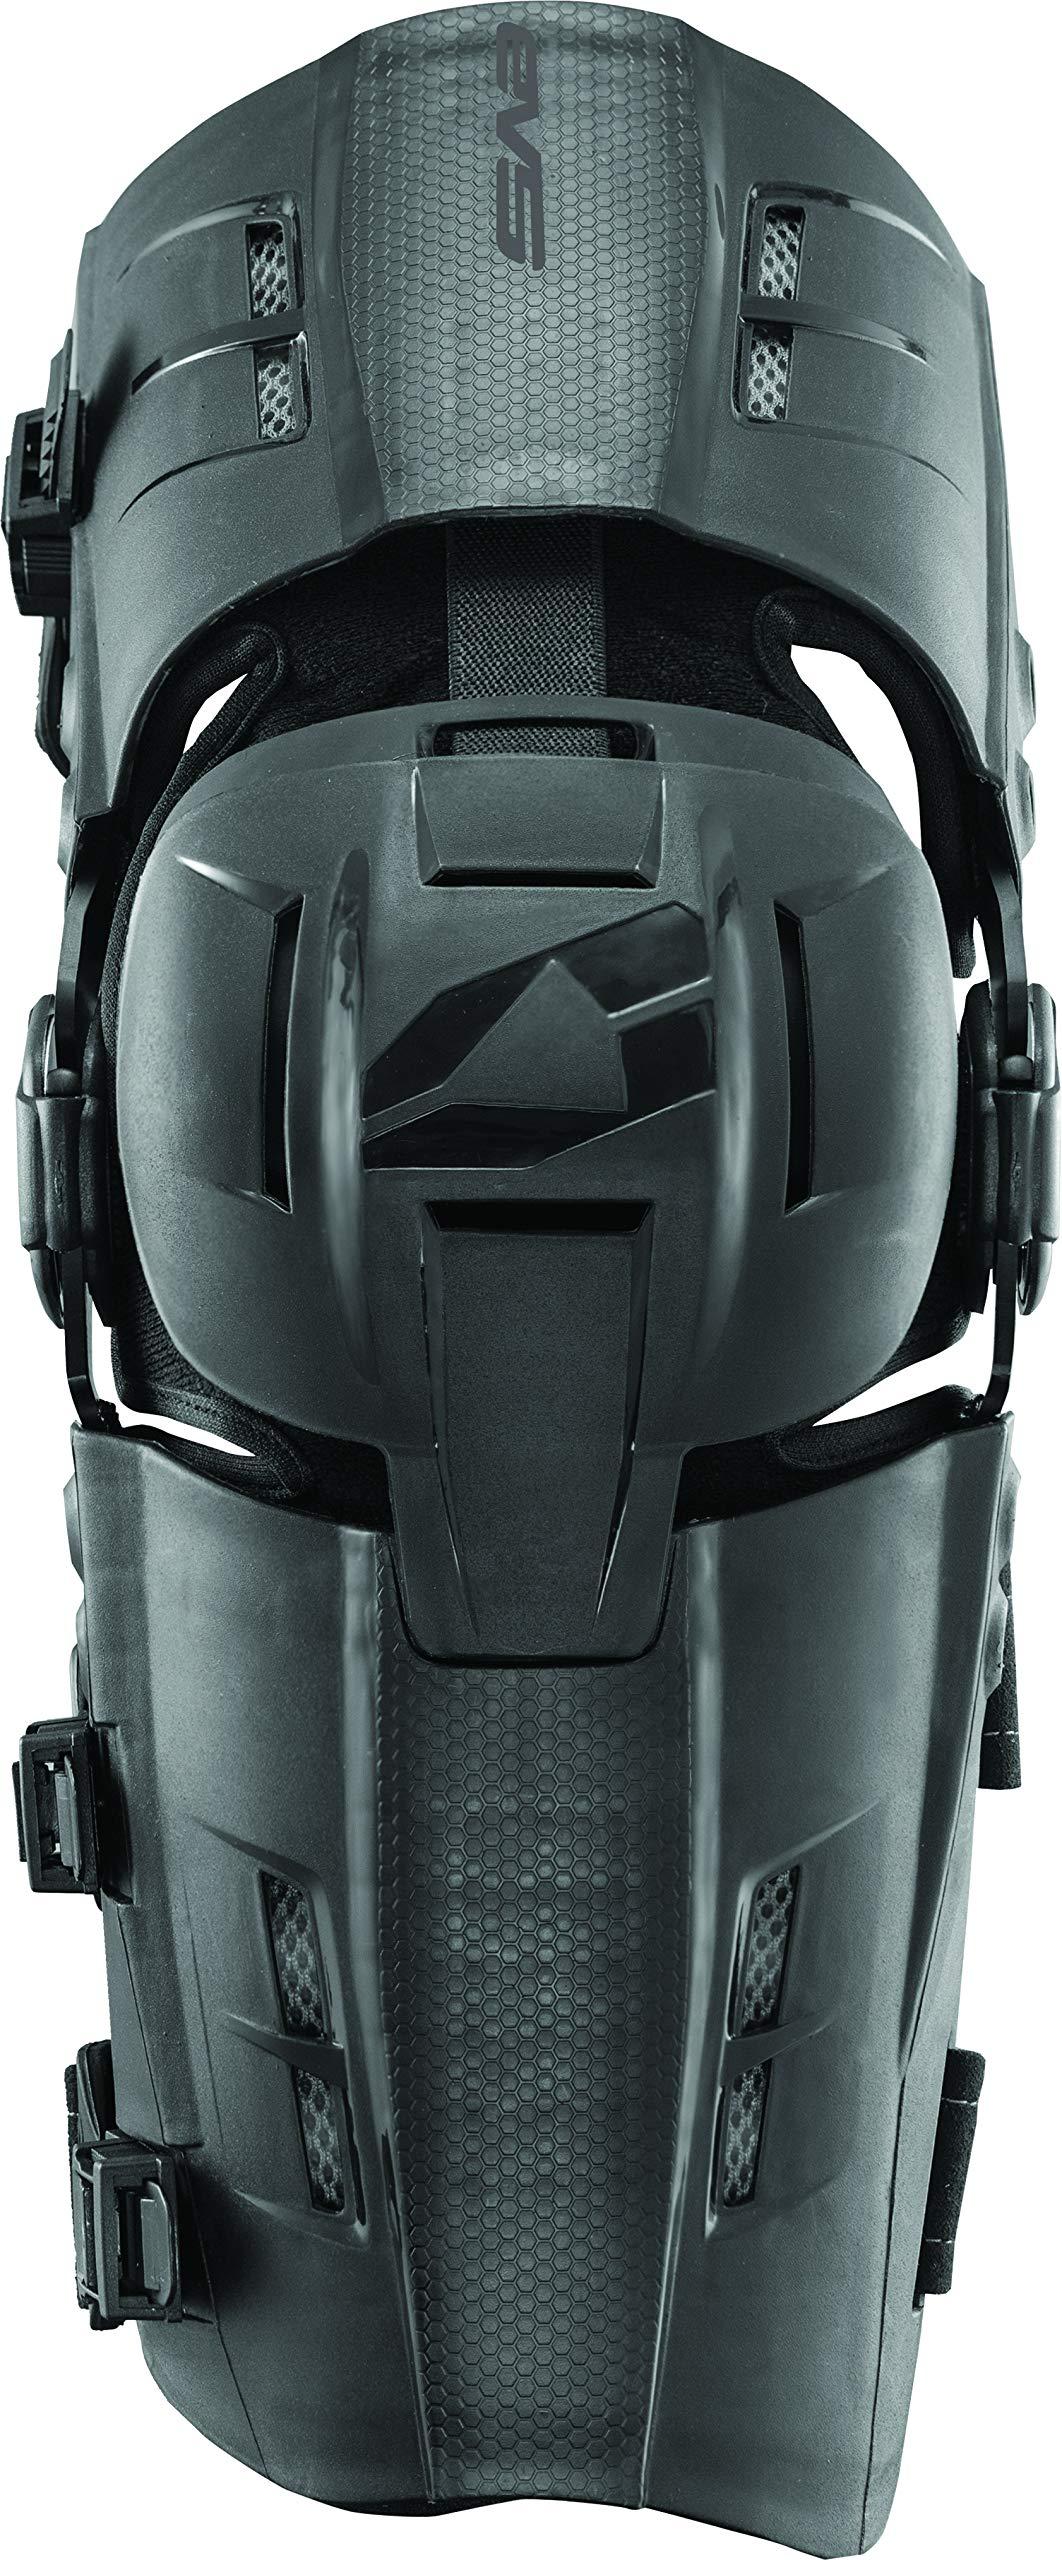 EVS Sports Men's Knee Brace (RS9 Pair) (Black, Large), 2 Pack